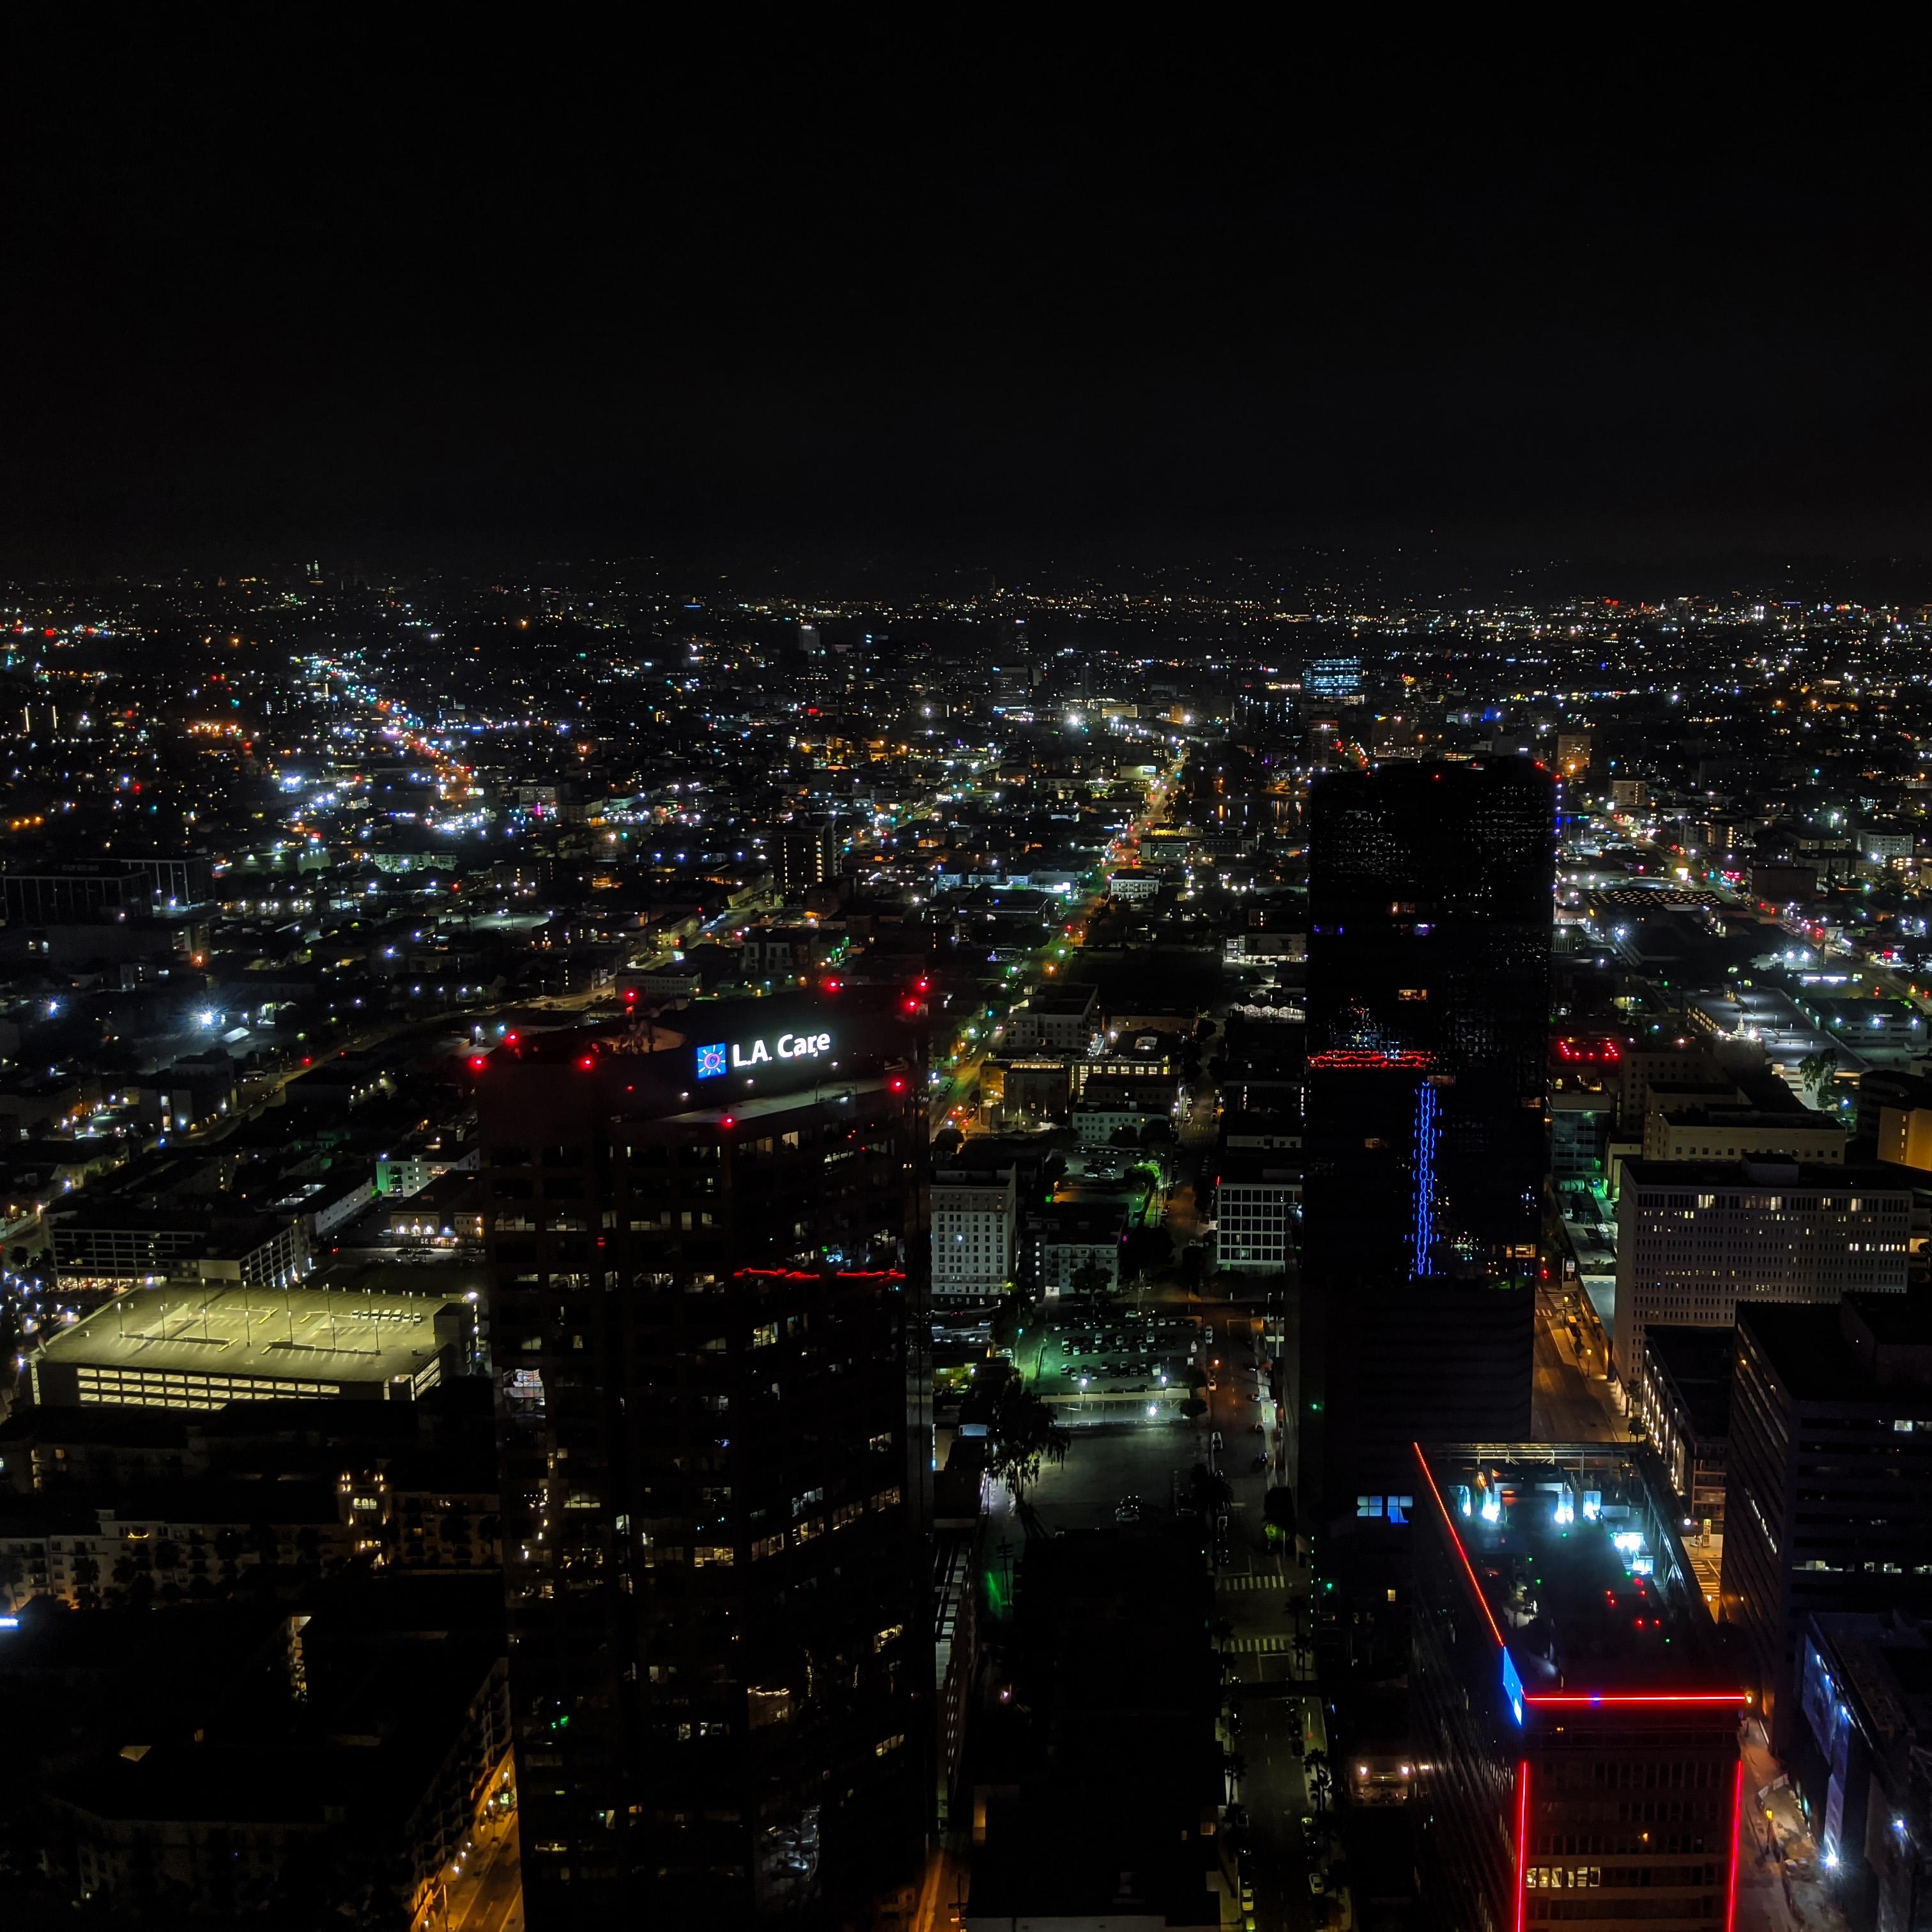 Ariel view of Los Angeles